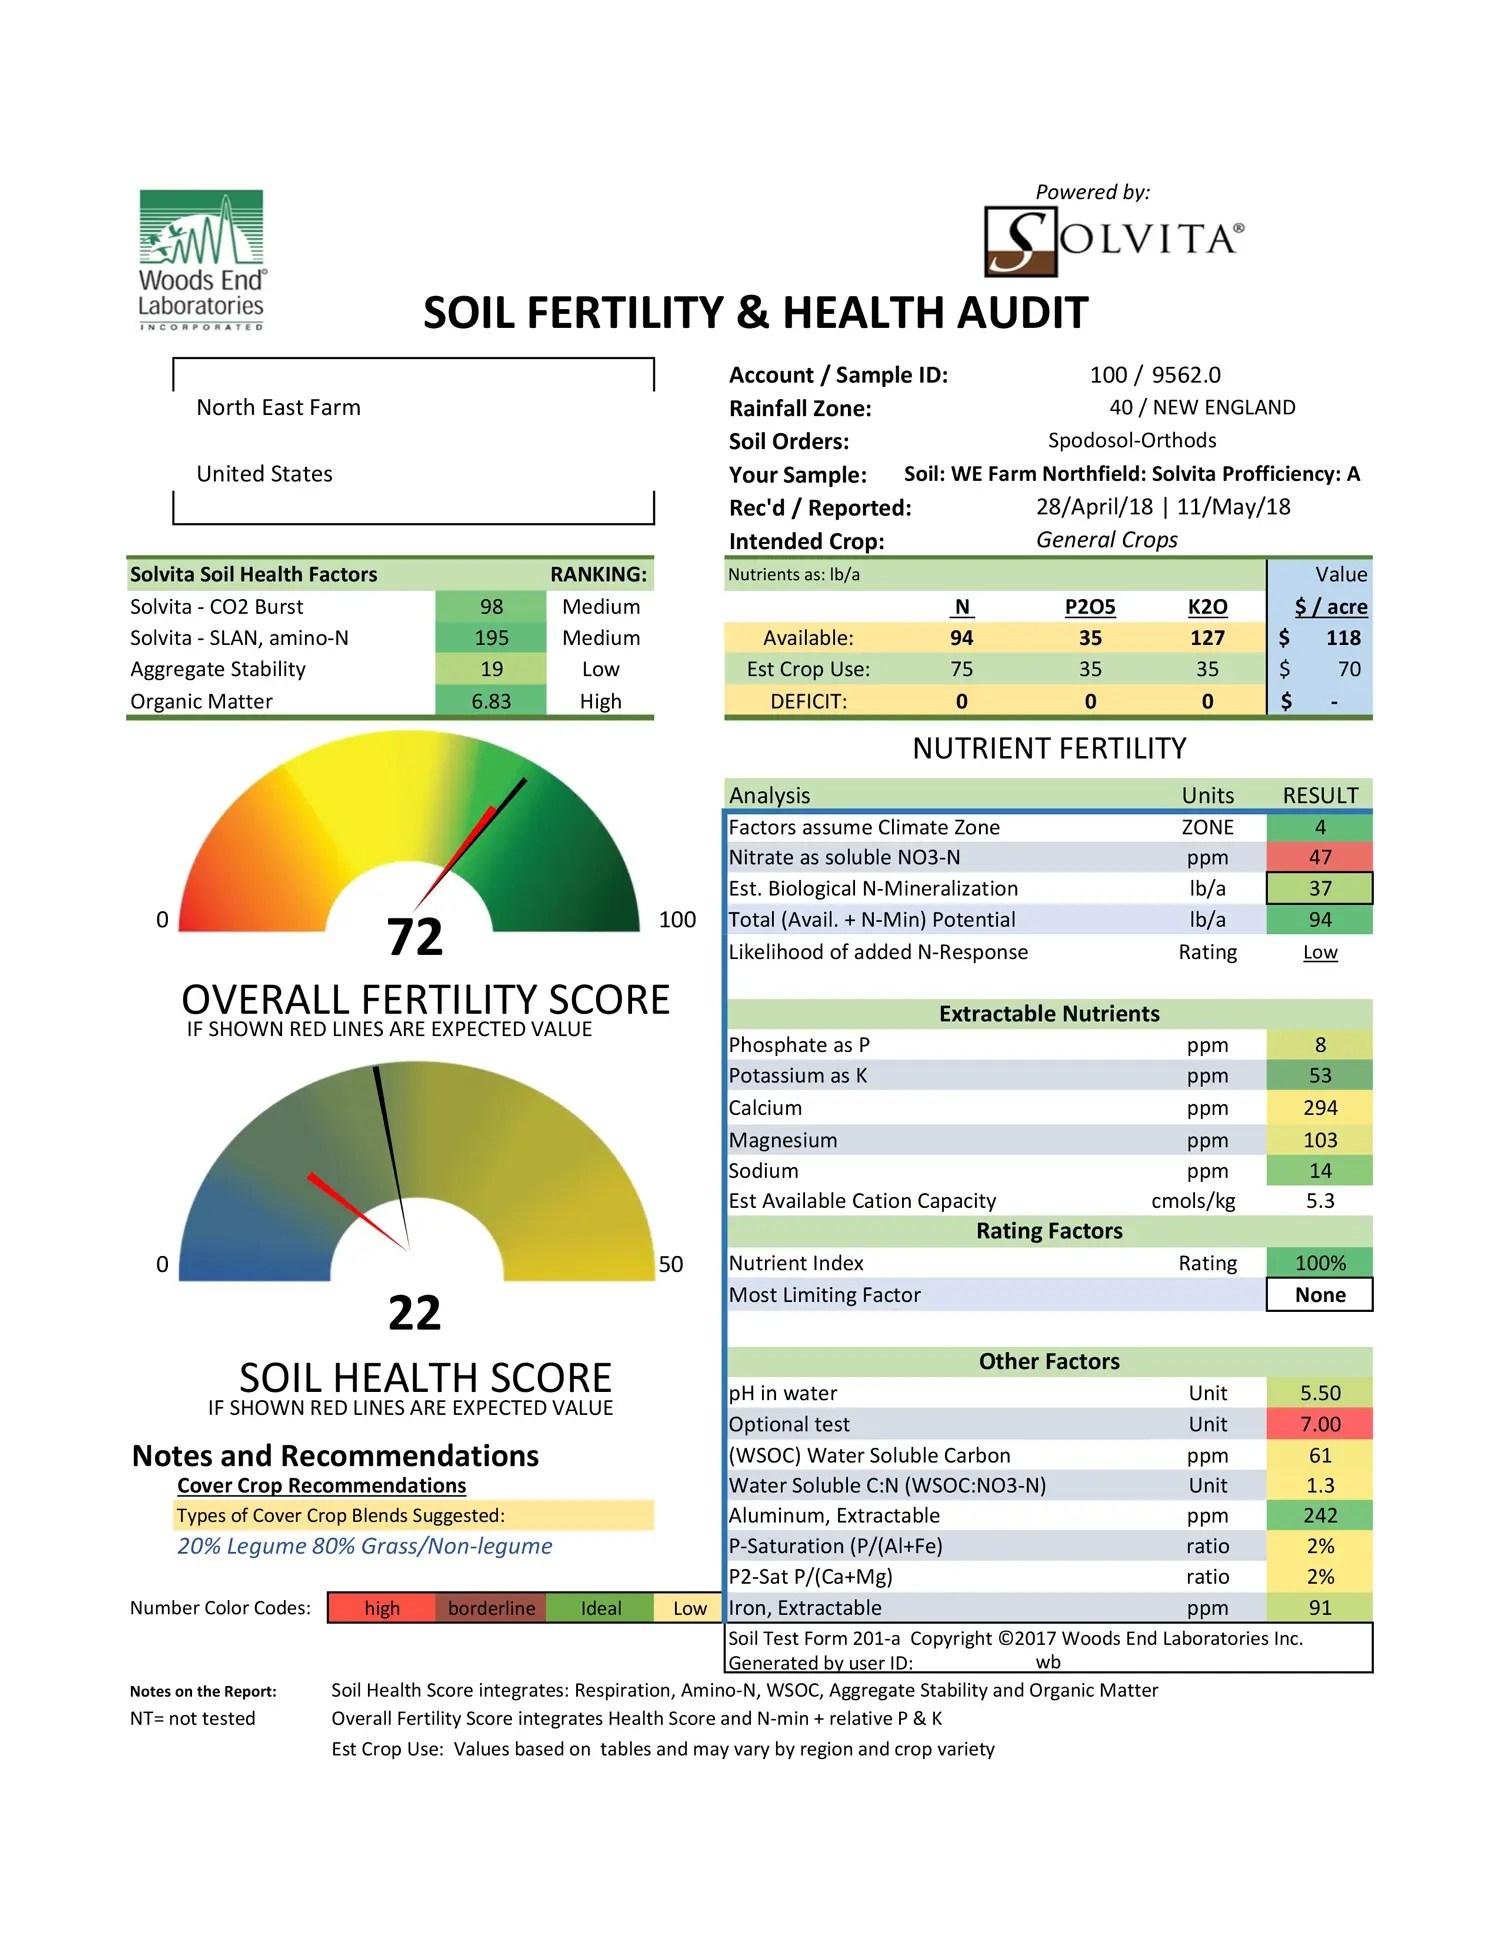 Biological Fertility